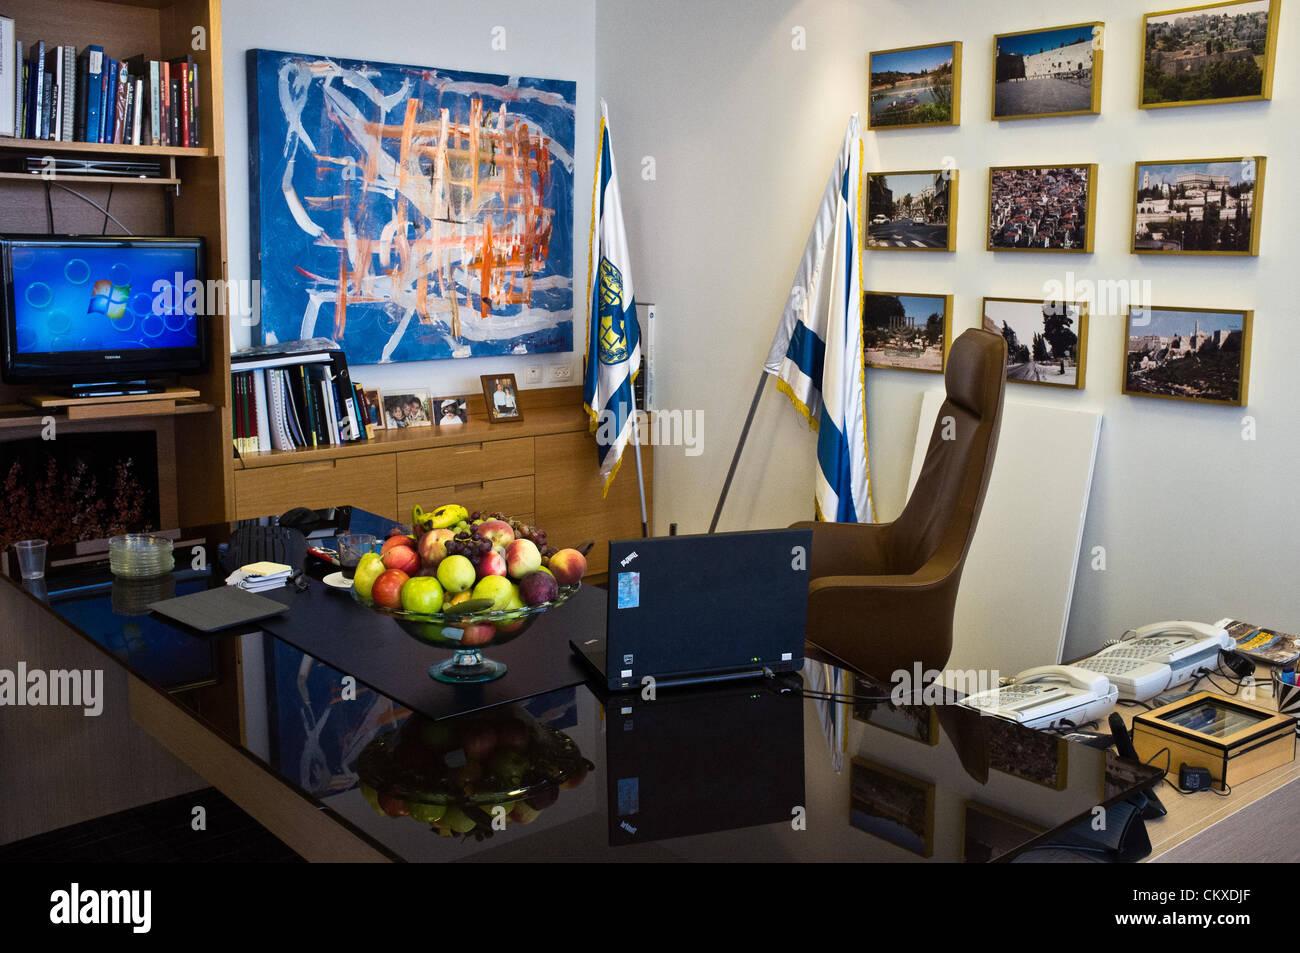 28th Aug 2012. Jerusalem, Israel. Jerusalem Mayor Nir Barkat's desk and office at City Hall.  Jerusalem Mayor Nir - Stock Image